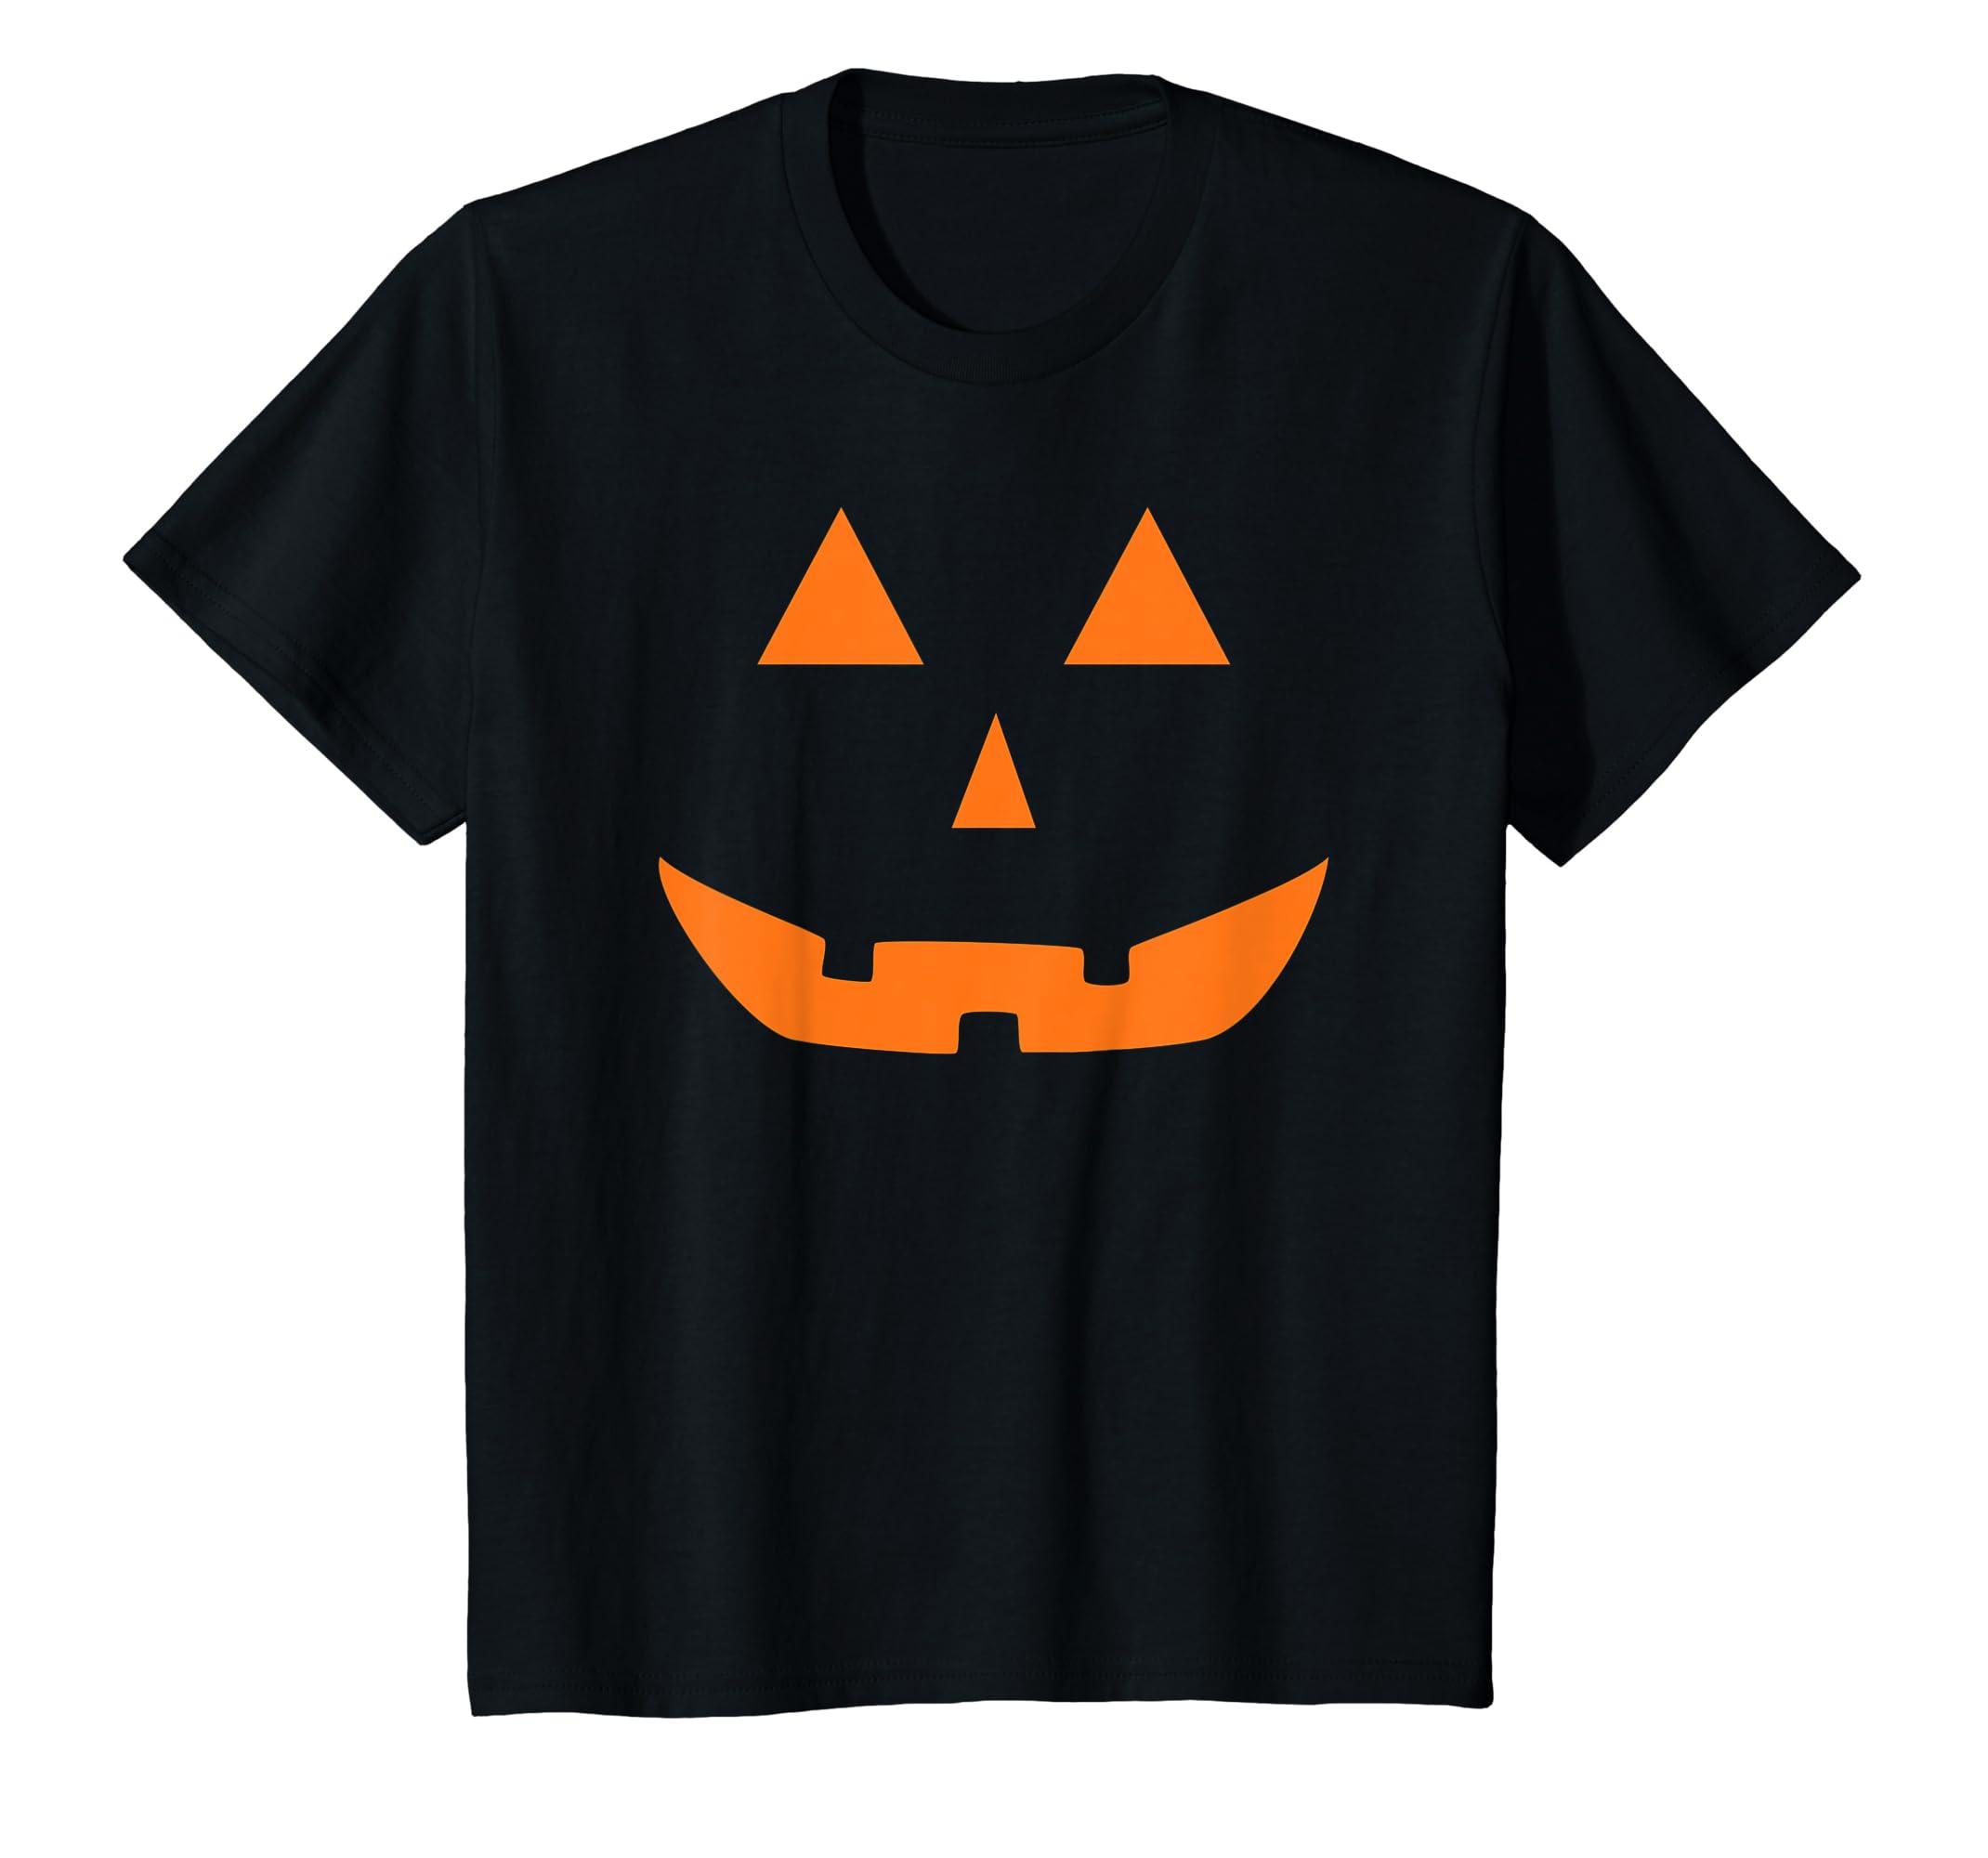 b689ba12159 Amazon.com  Jack O  Lantern Pumpkin Halloween Costume T-Shirt Funny   Clothing